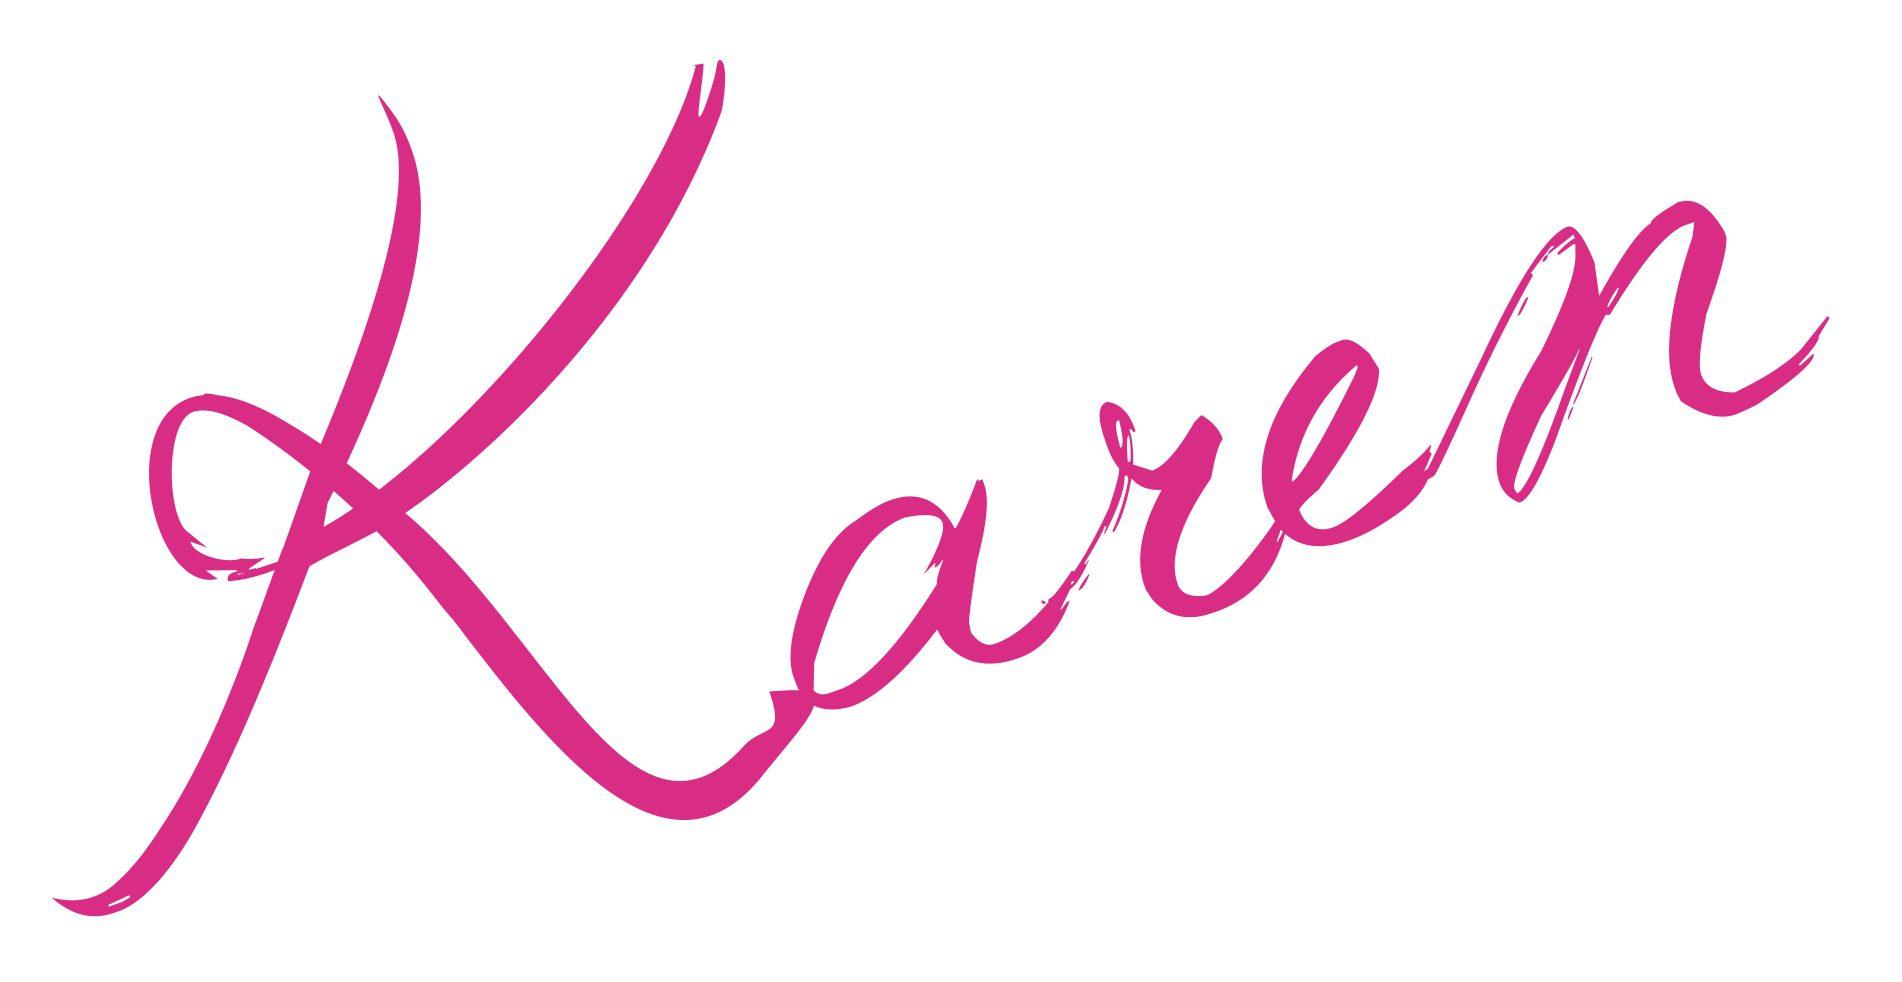 cropped-karen-signature-jpg.jpeg